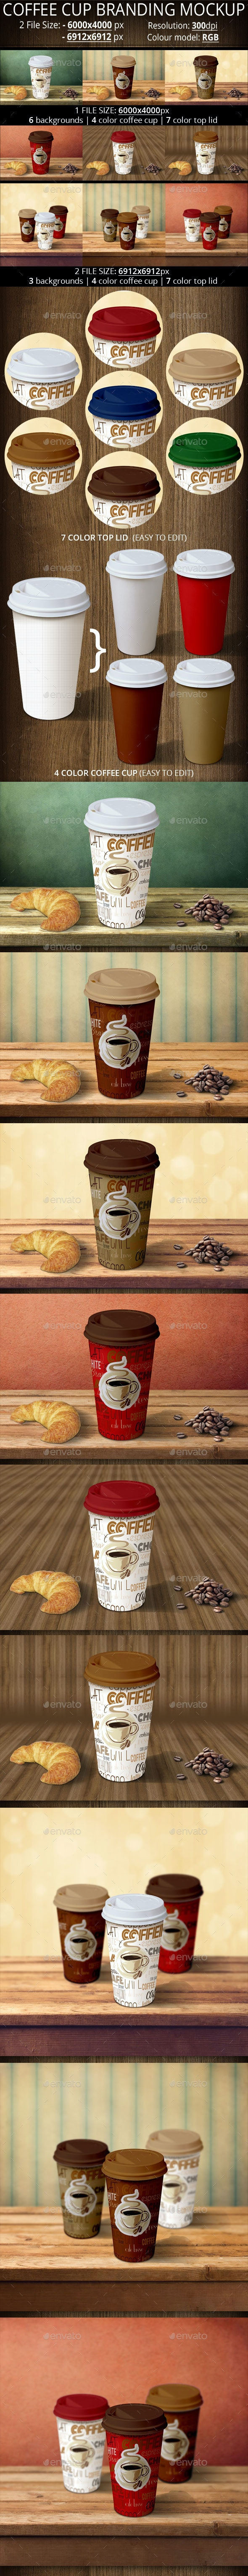 Two Coffee Cup Branding Mockup - Food and Drink Packaging